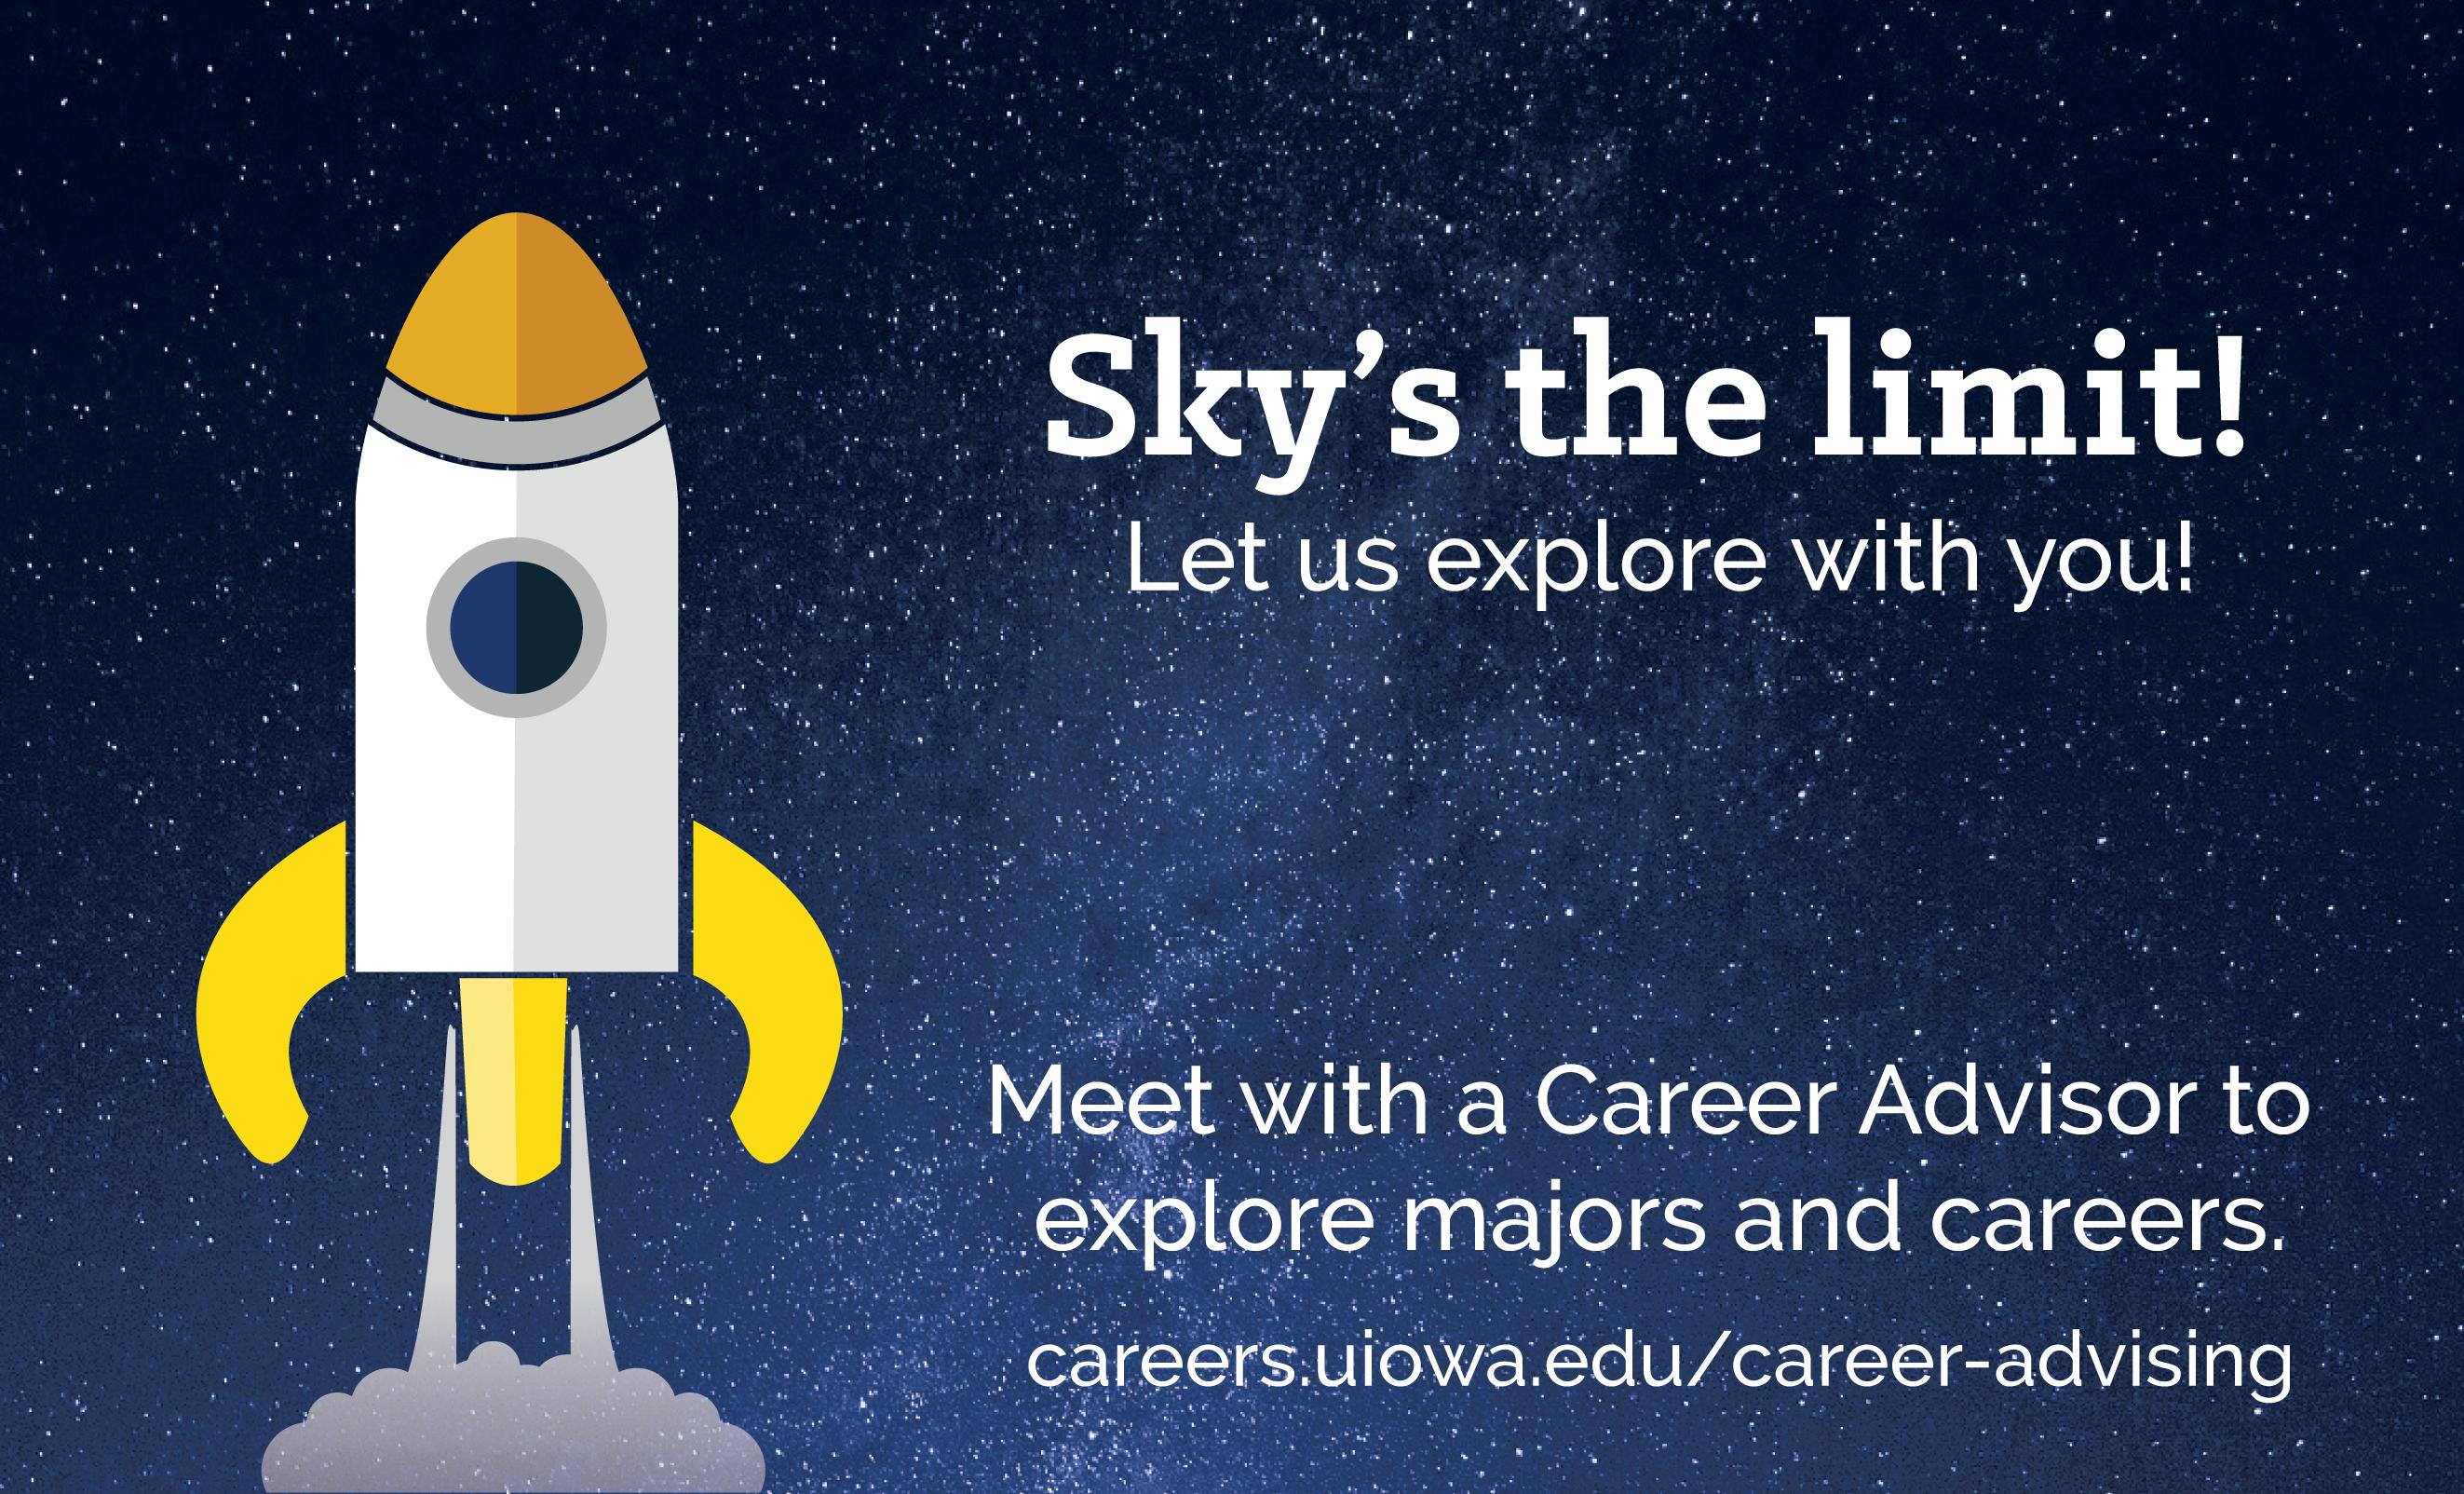 Meet with a Career Advisor to explore majors and careers.